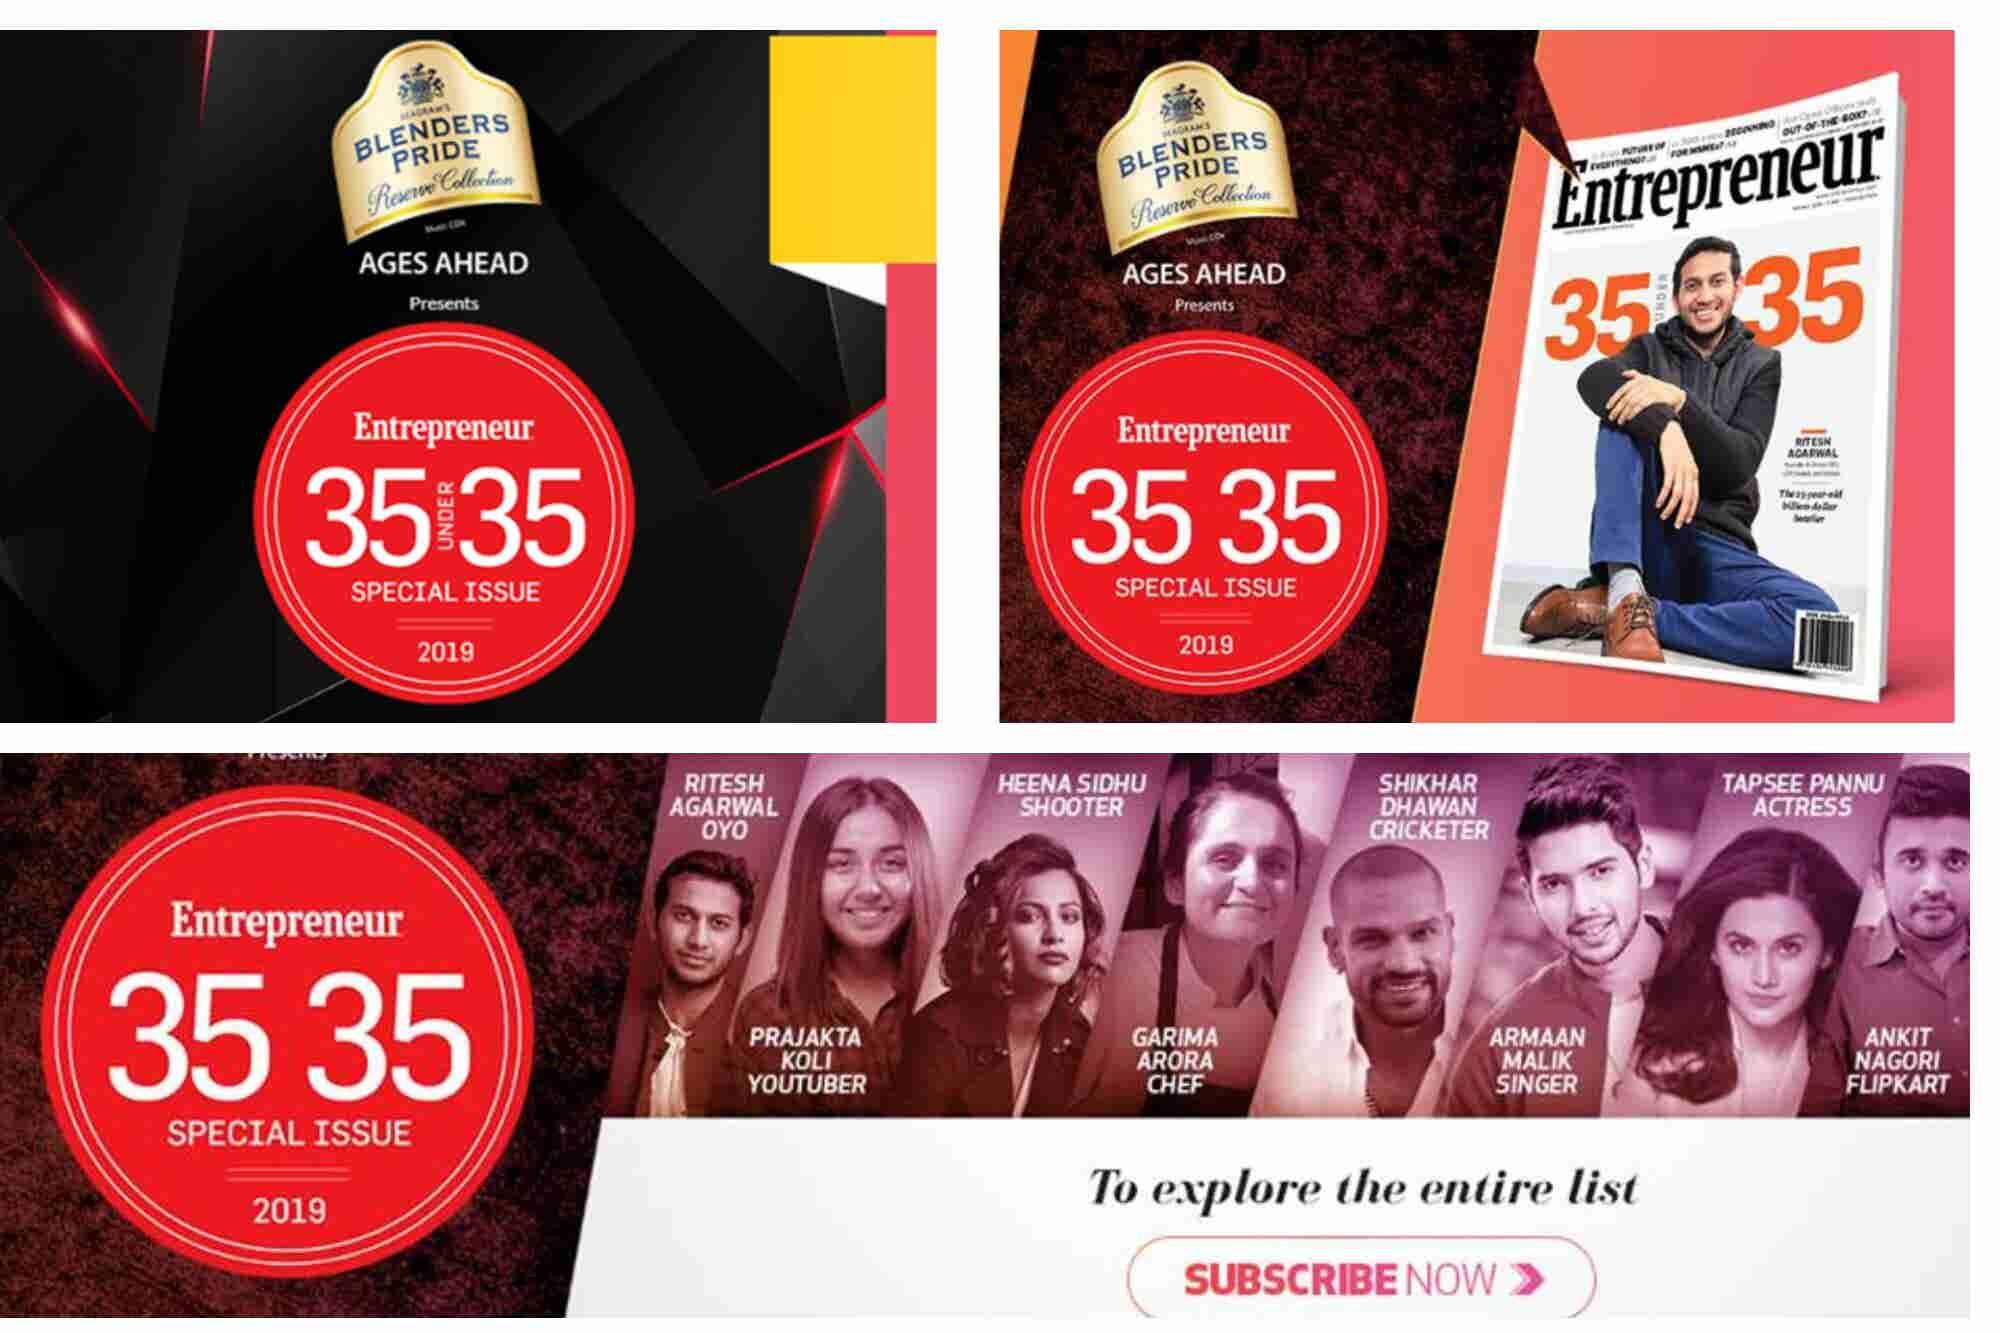 Entrepreneur's 35U35: The Business Spectacle